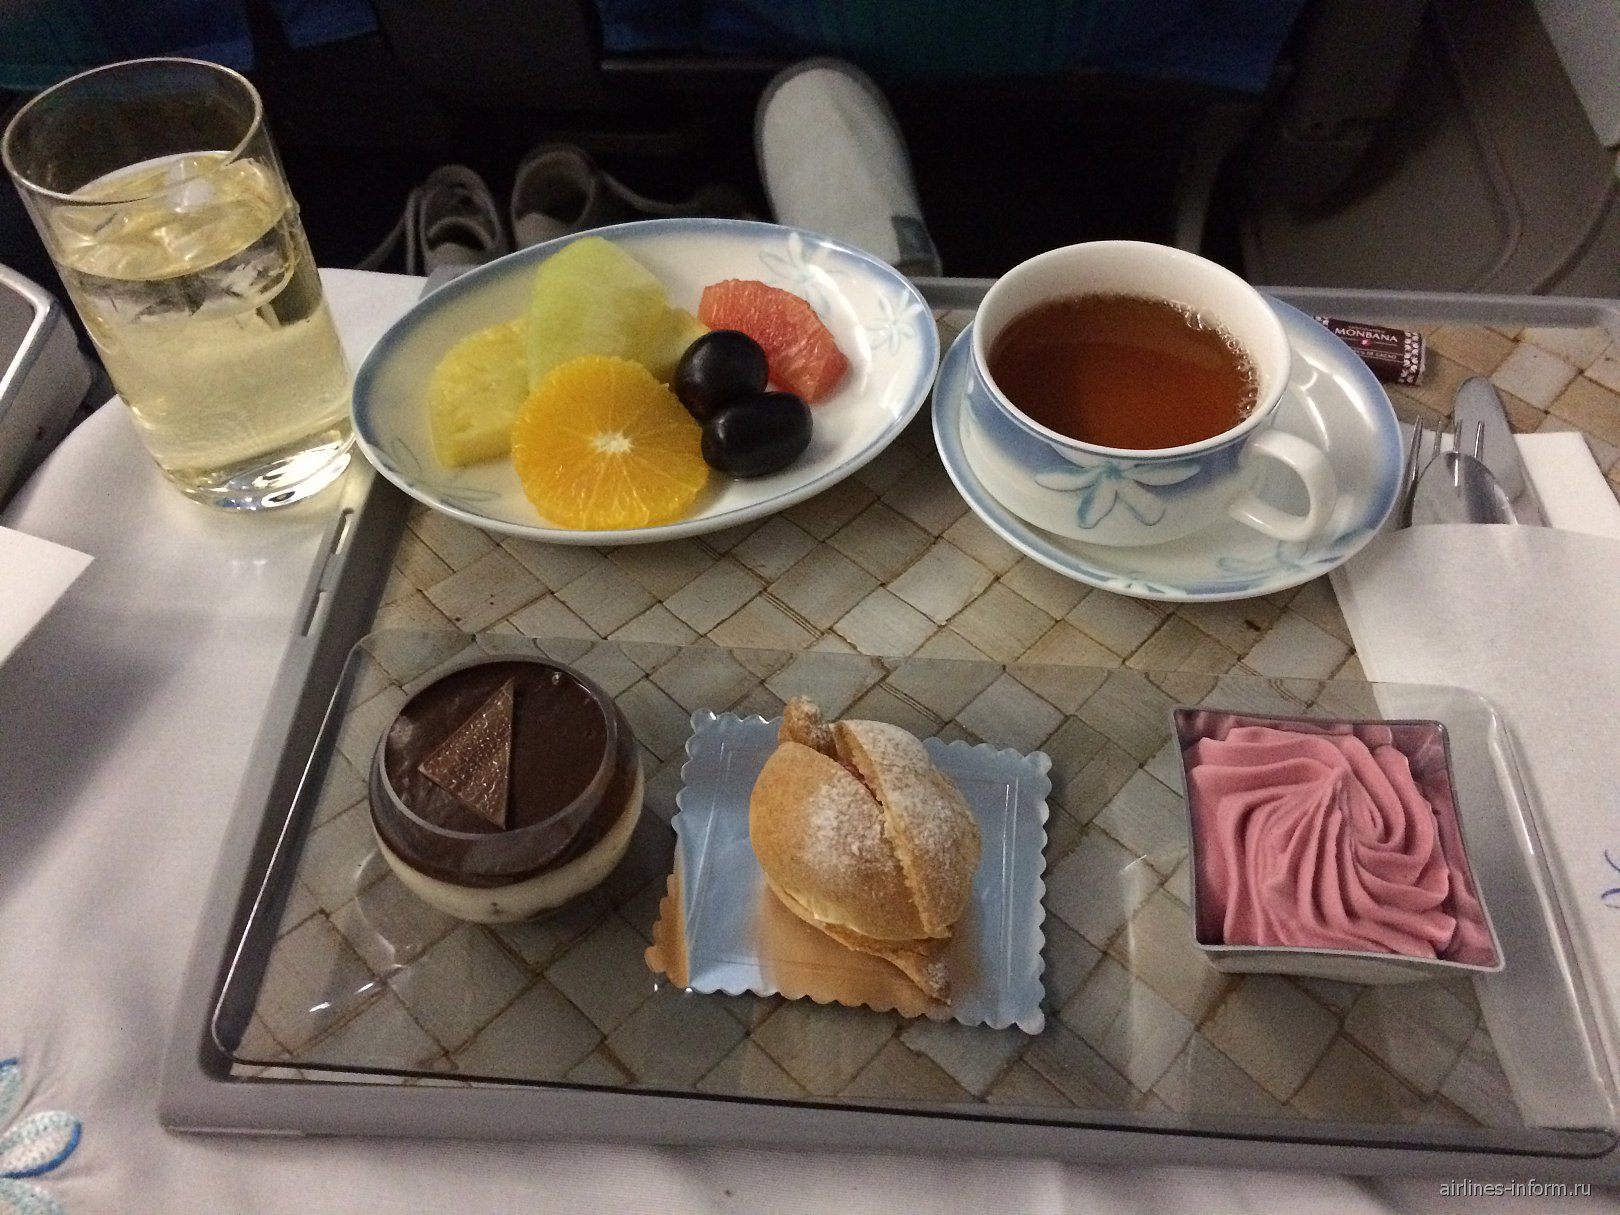 Десерт в бизнес-классе авиакомпании Air Tahiti Nui на рейсе Токио-Папеэте